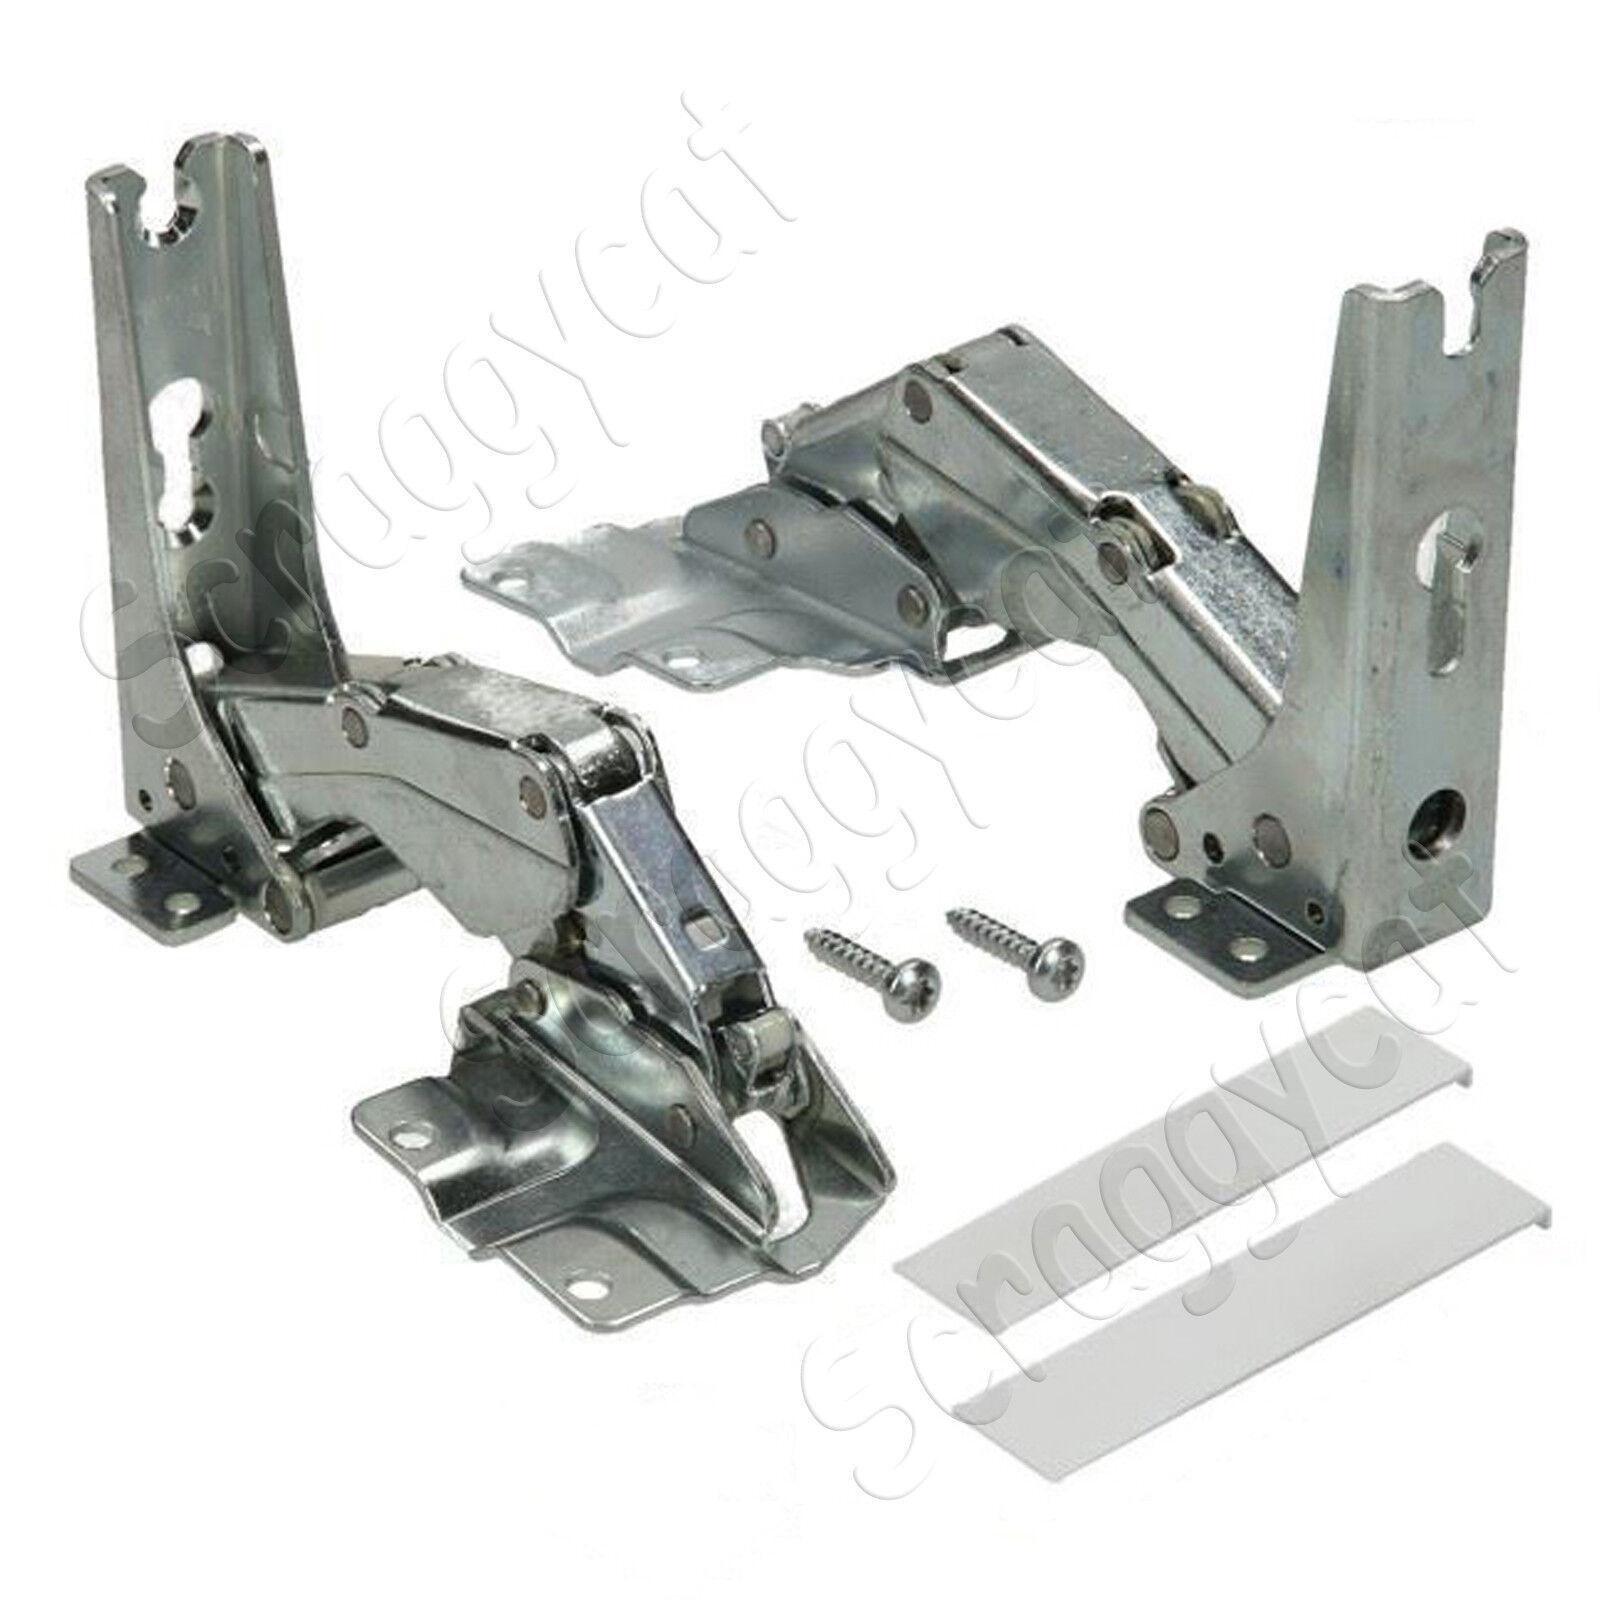 2 Hinges For Bosch Neff Siemens Integrated Fridge Freezer 481147 Left or Right